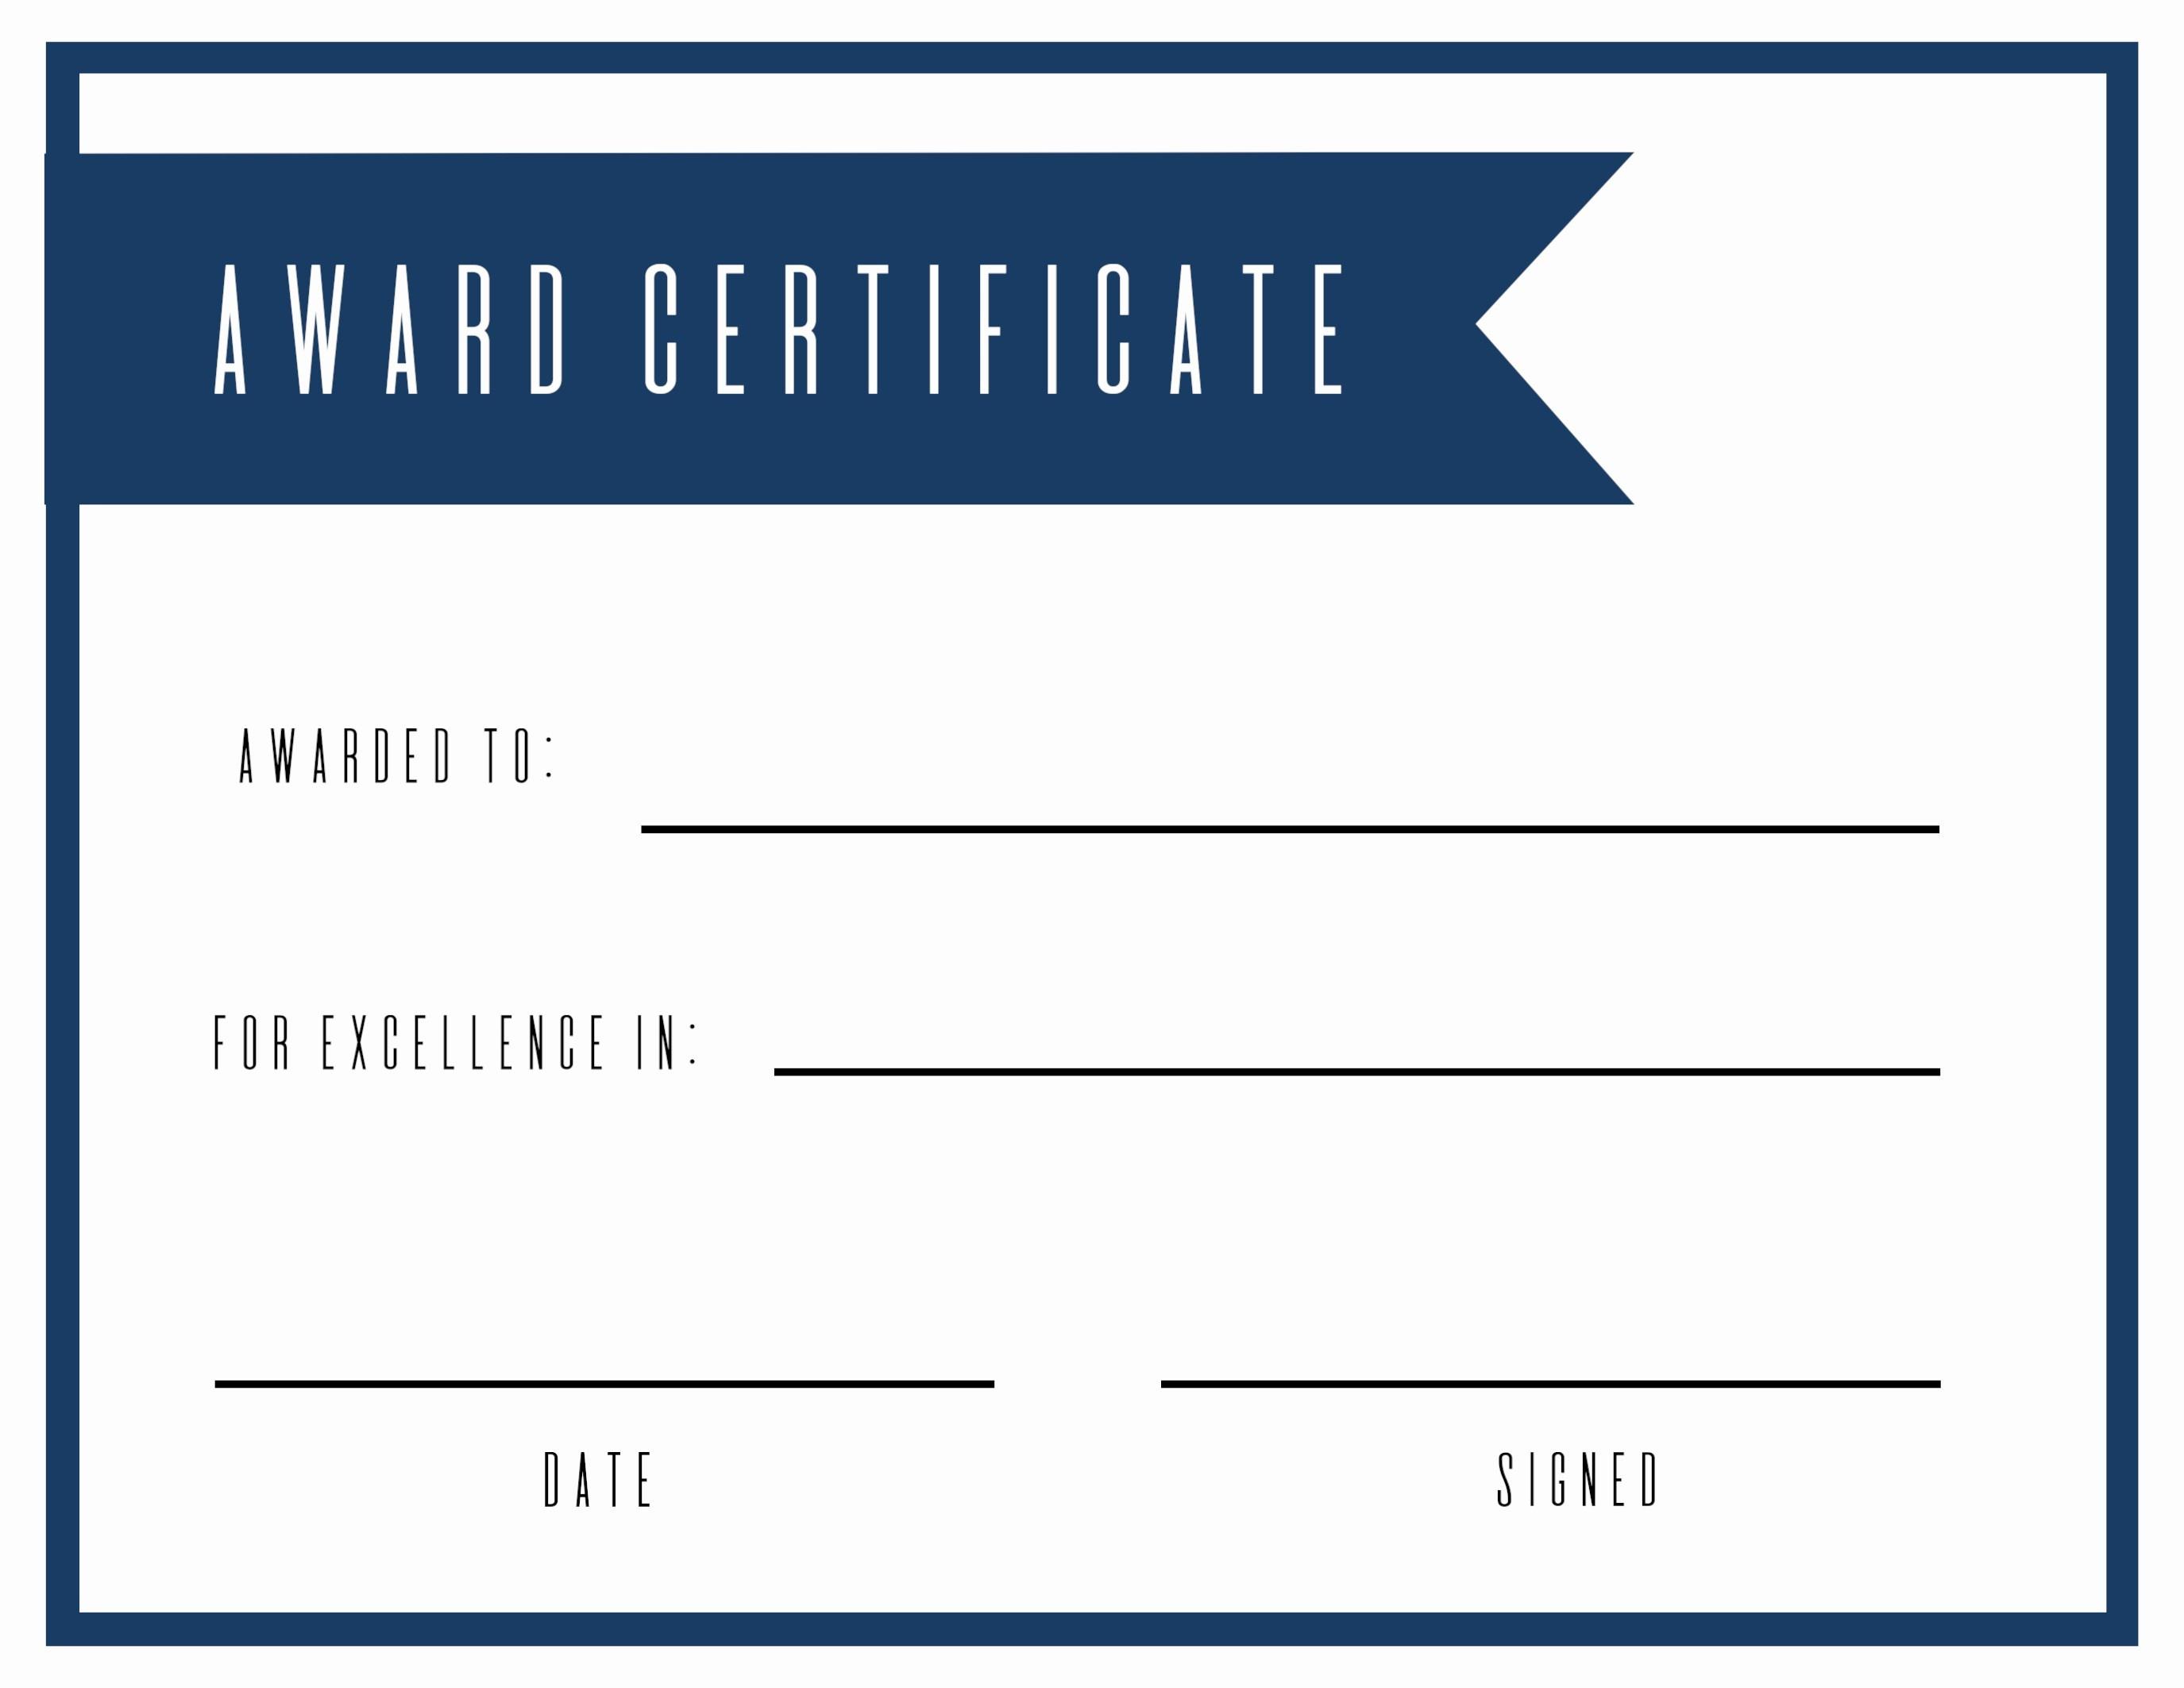 027 Free Printable Diploma Template Elegant Award Certificate Paper - Free Printable Student Award Certificate Template